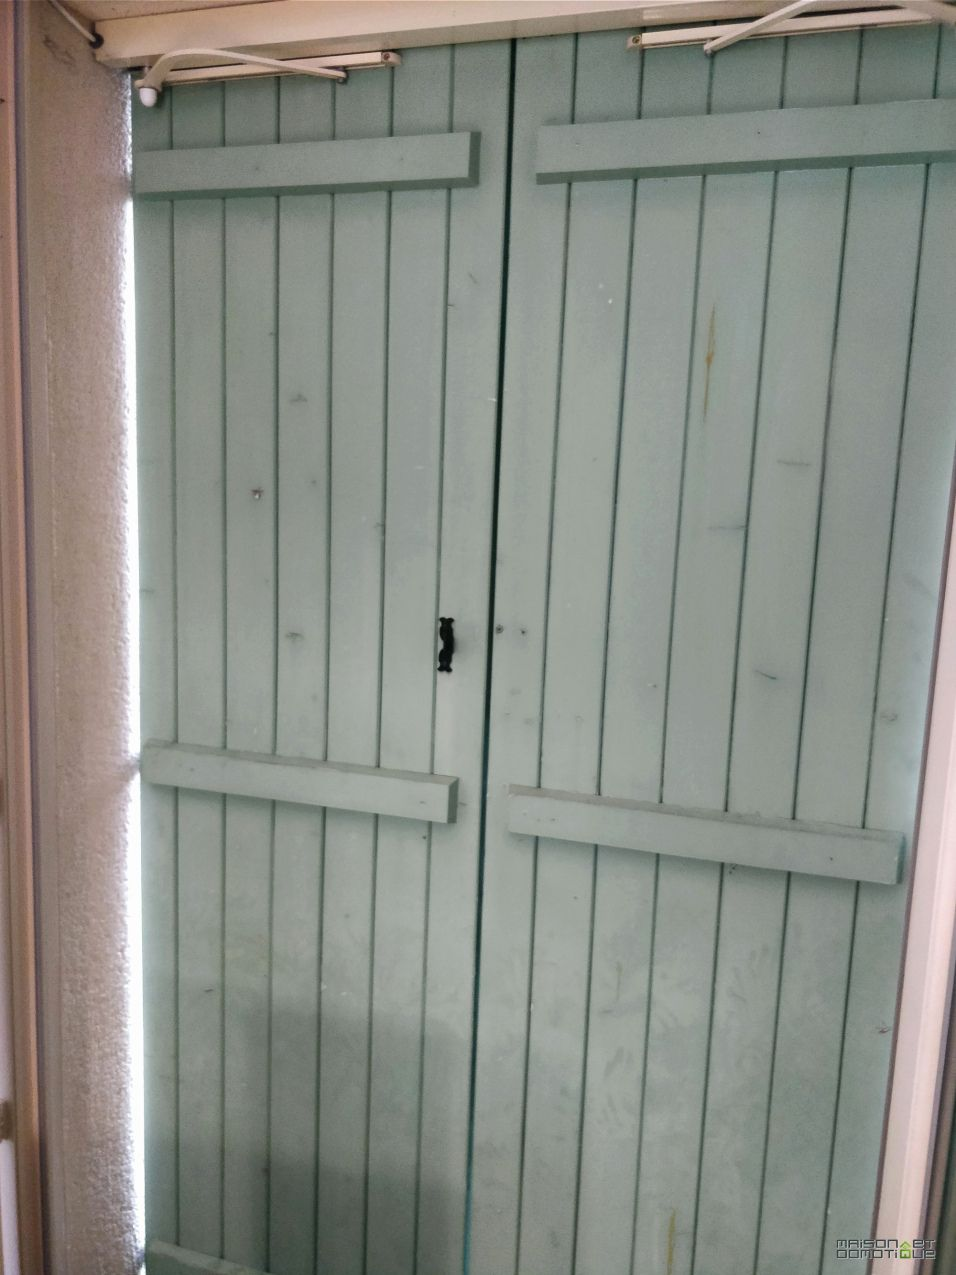 50 Fenetre Pvc Leroy Merlin Sur Mesure 2020 Tall Cabinet Storage Indoor Garden Tall Storage